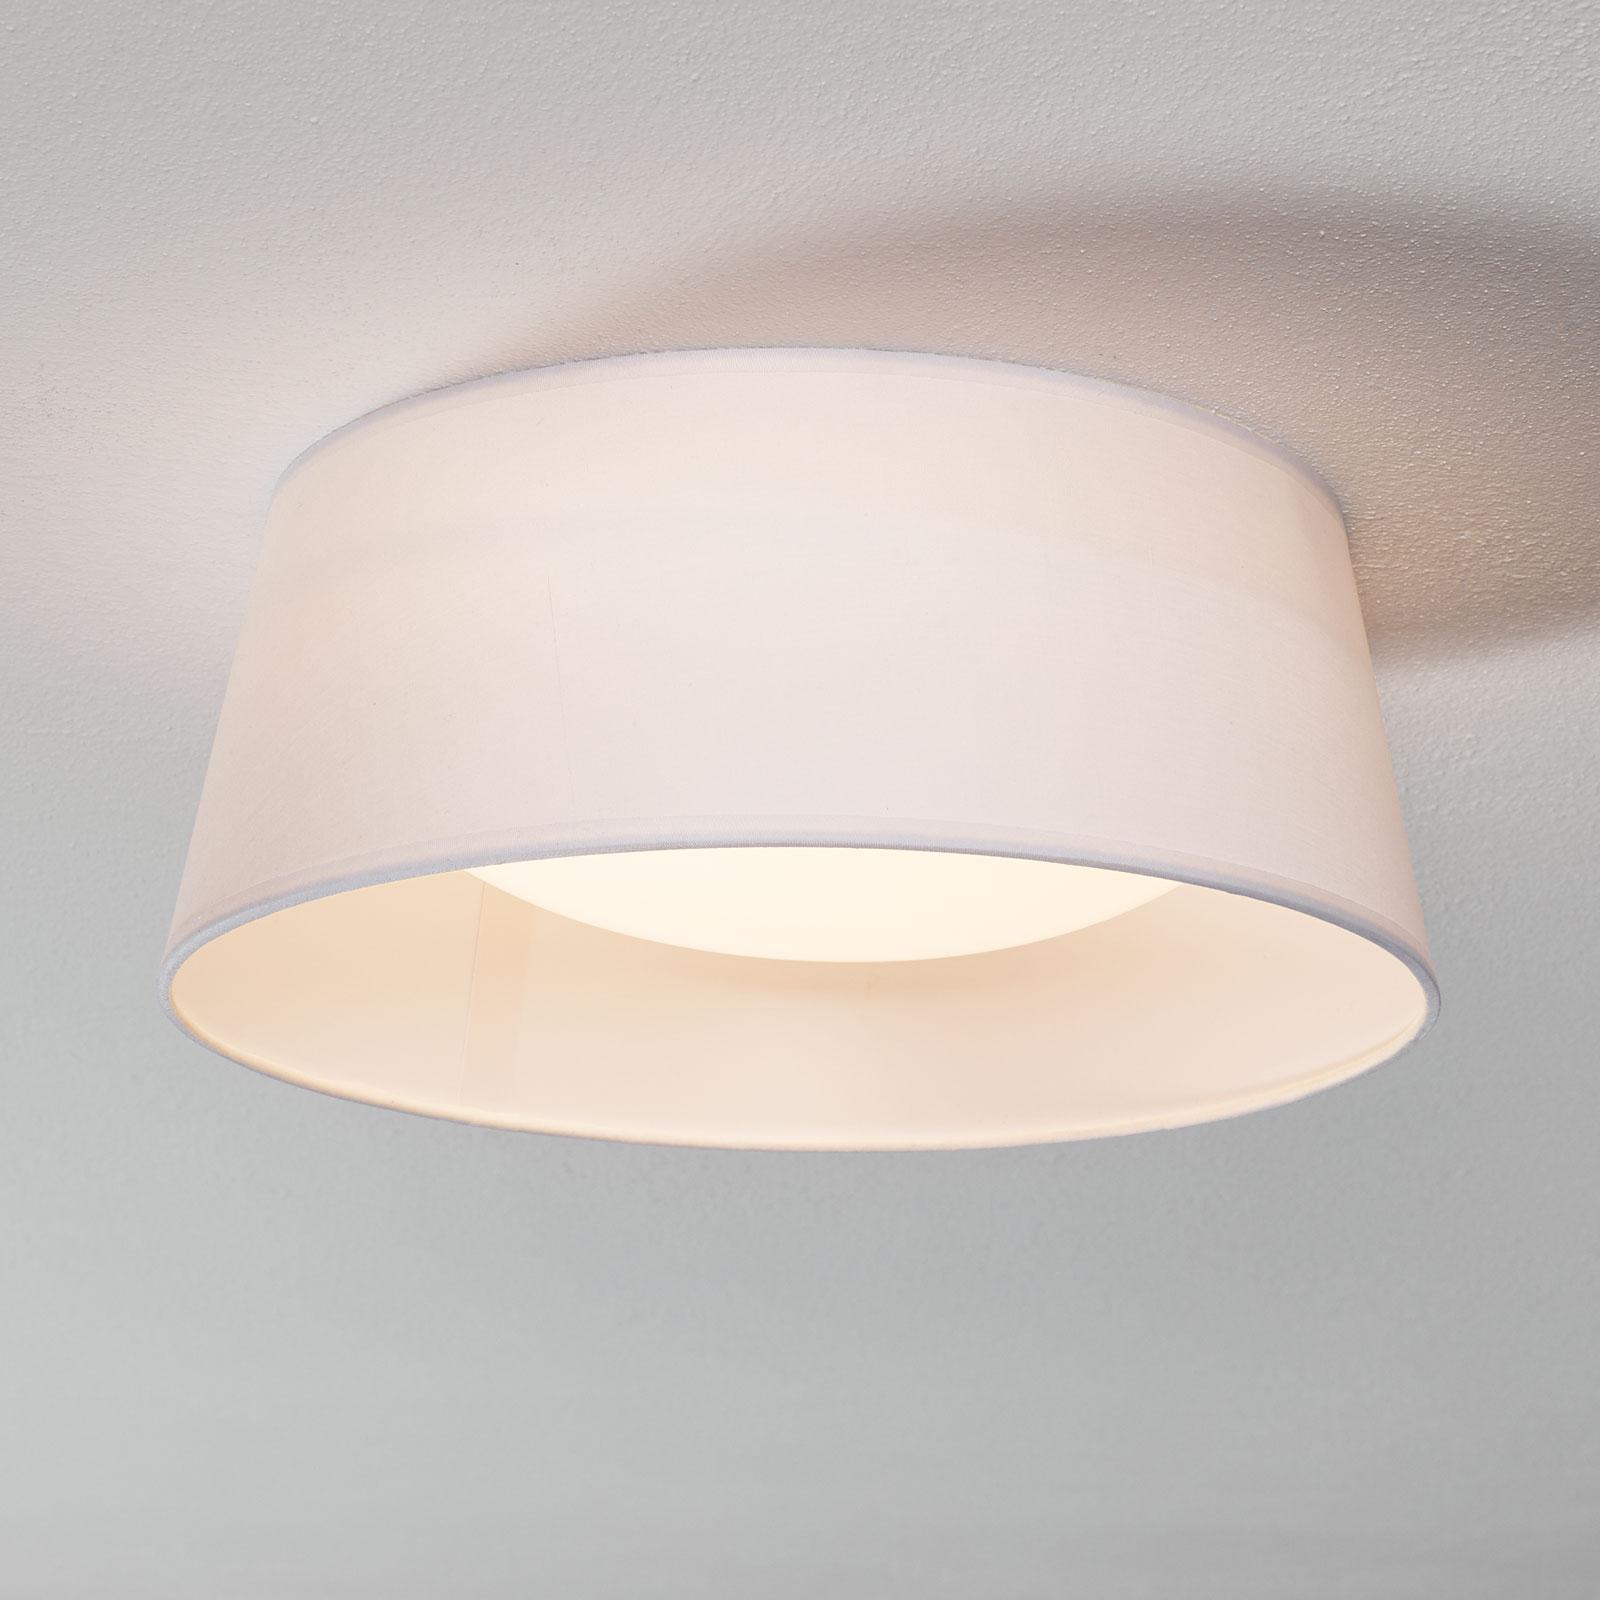 Witte textiel plafondlamp Ponts met LED's